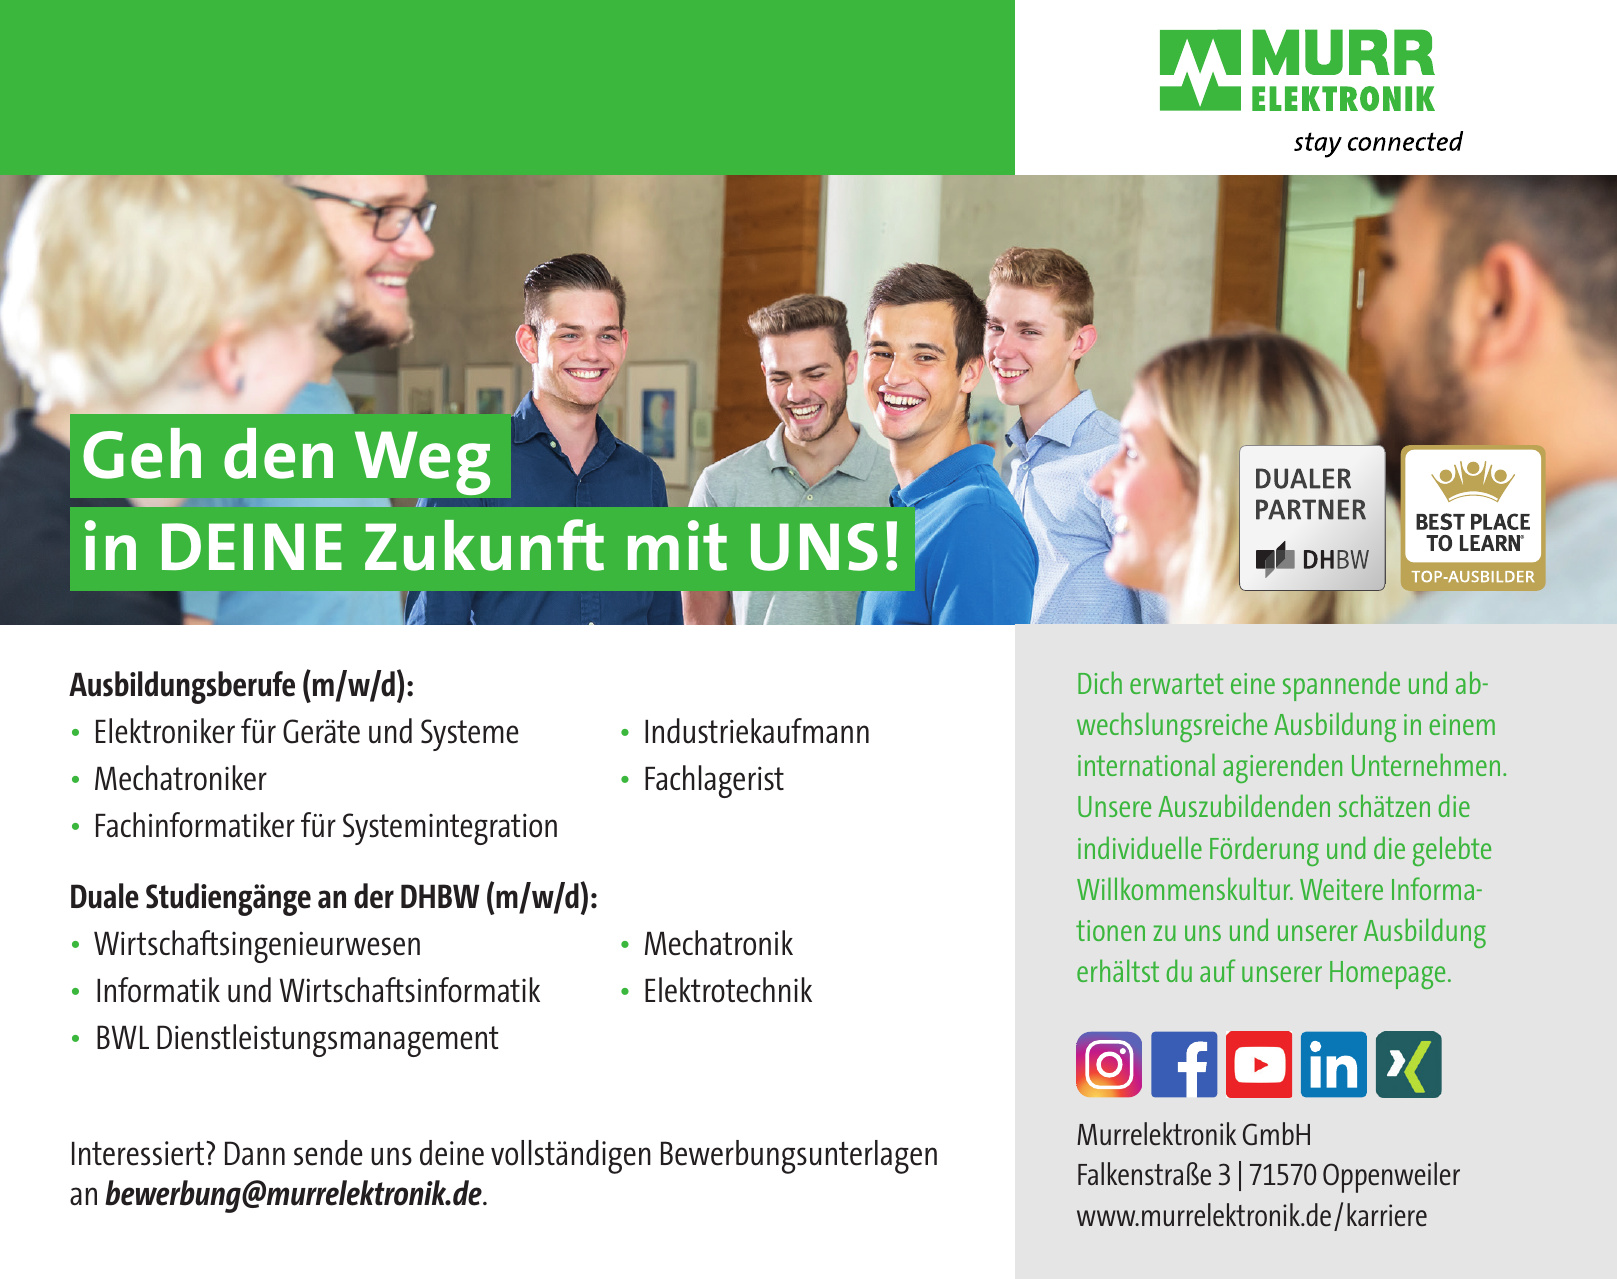 Murrelektronik GmbH